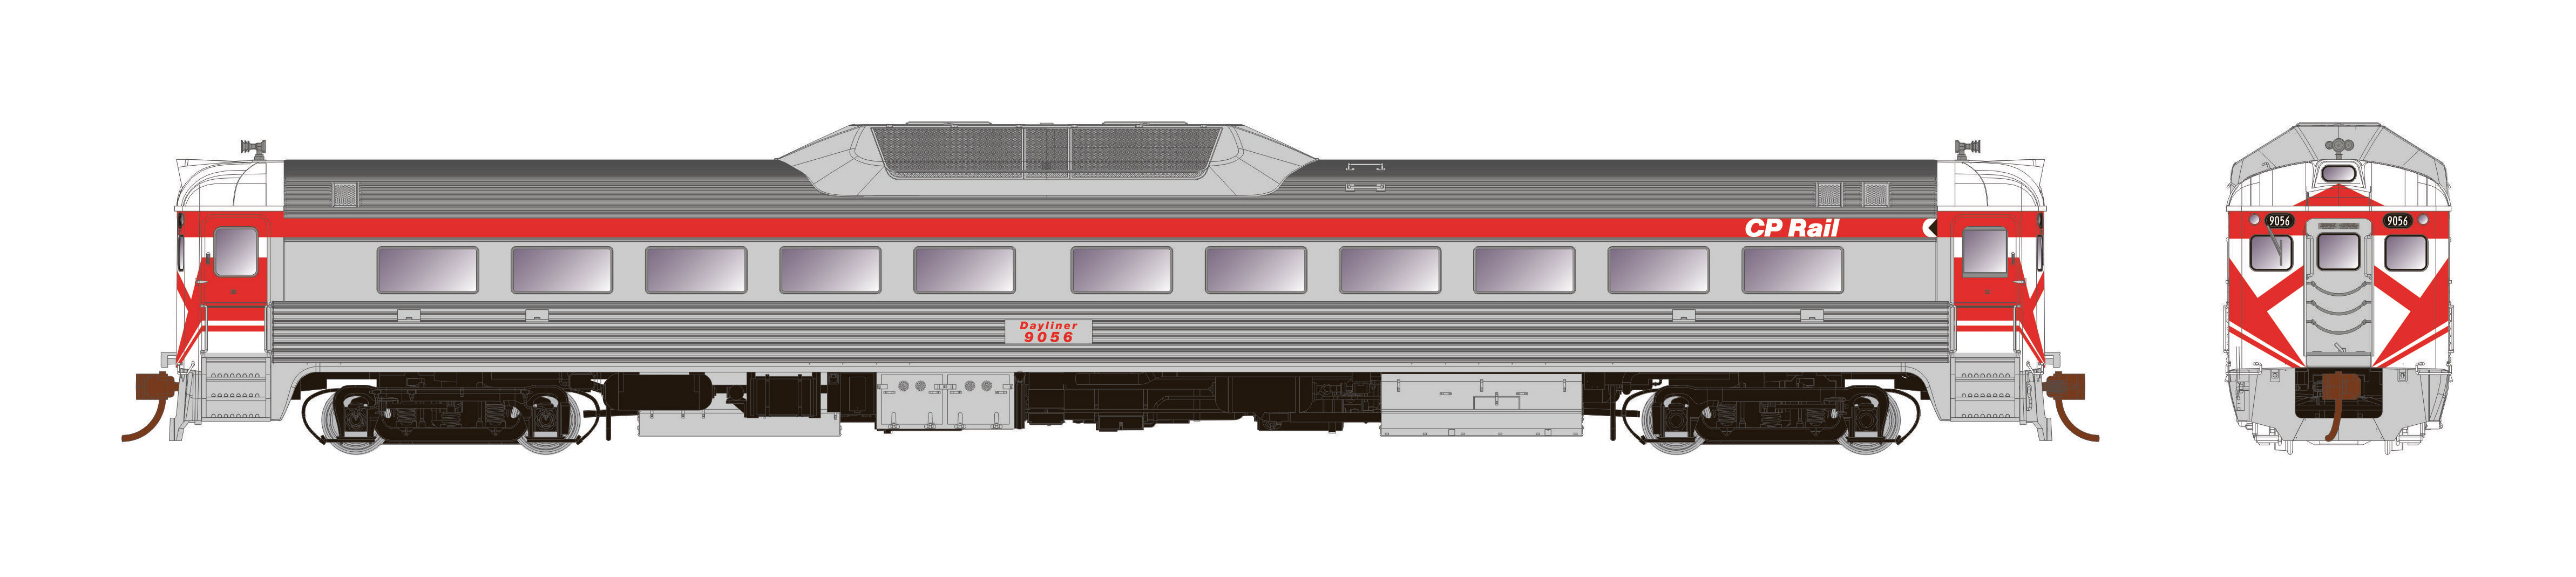 Rapido Trains 16707 - HO Budd RDC-1 - PH2 - DCC/Sound - CP Rail #9071